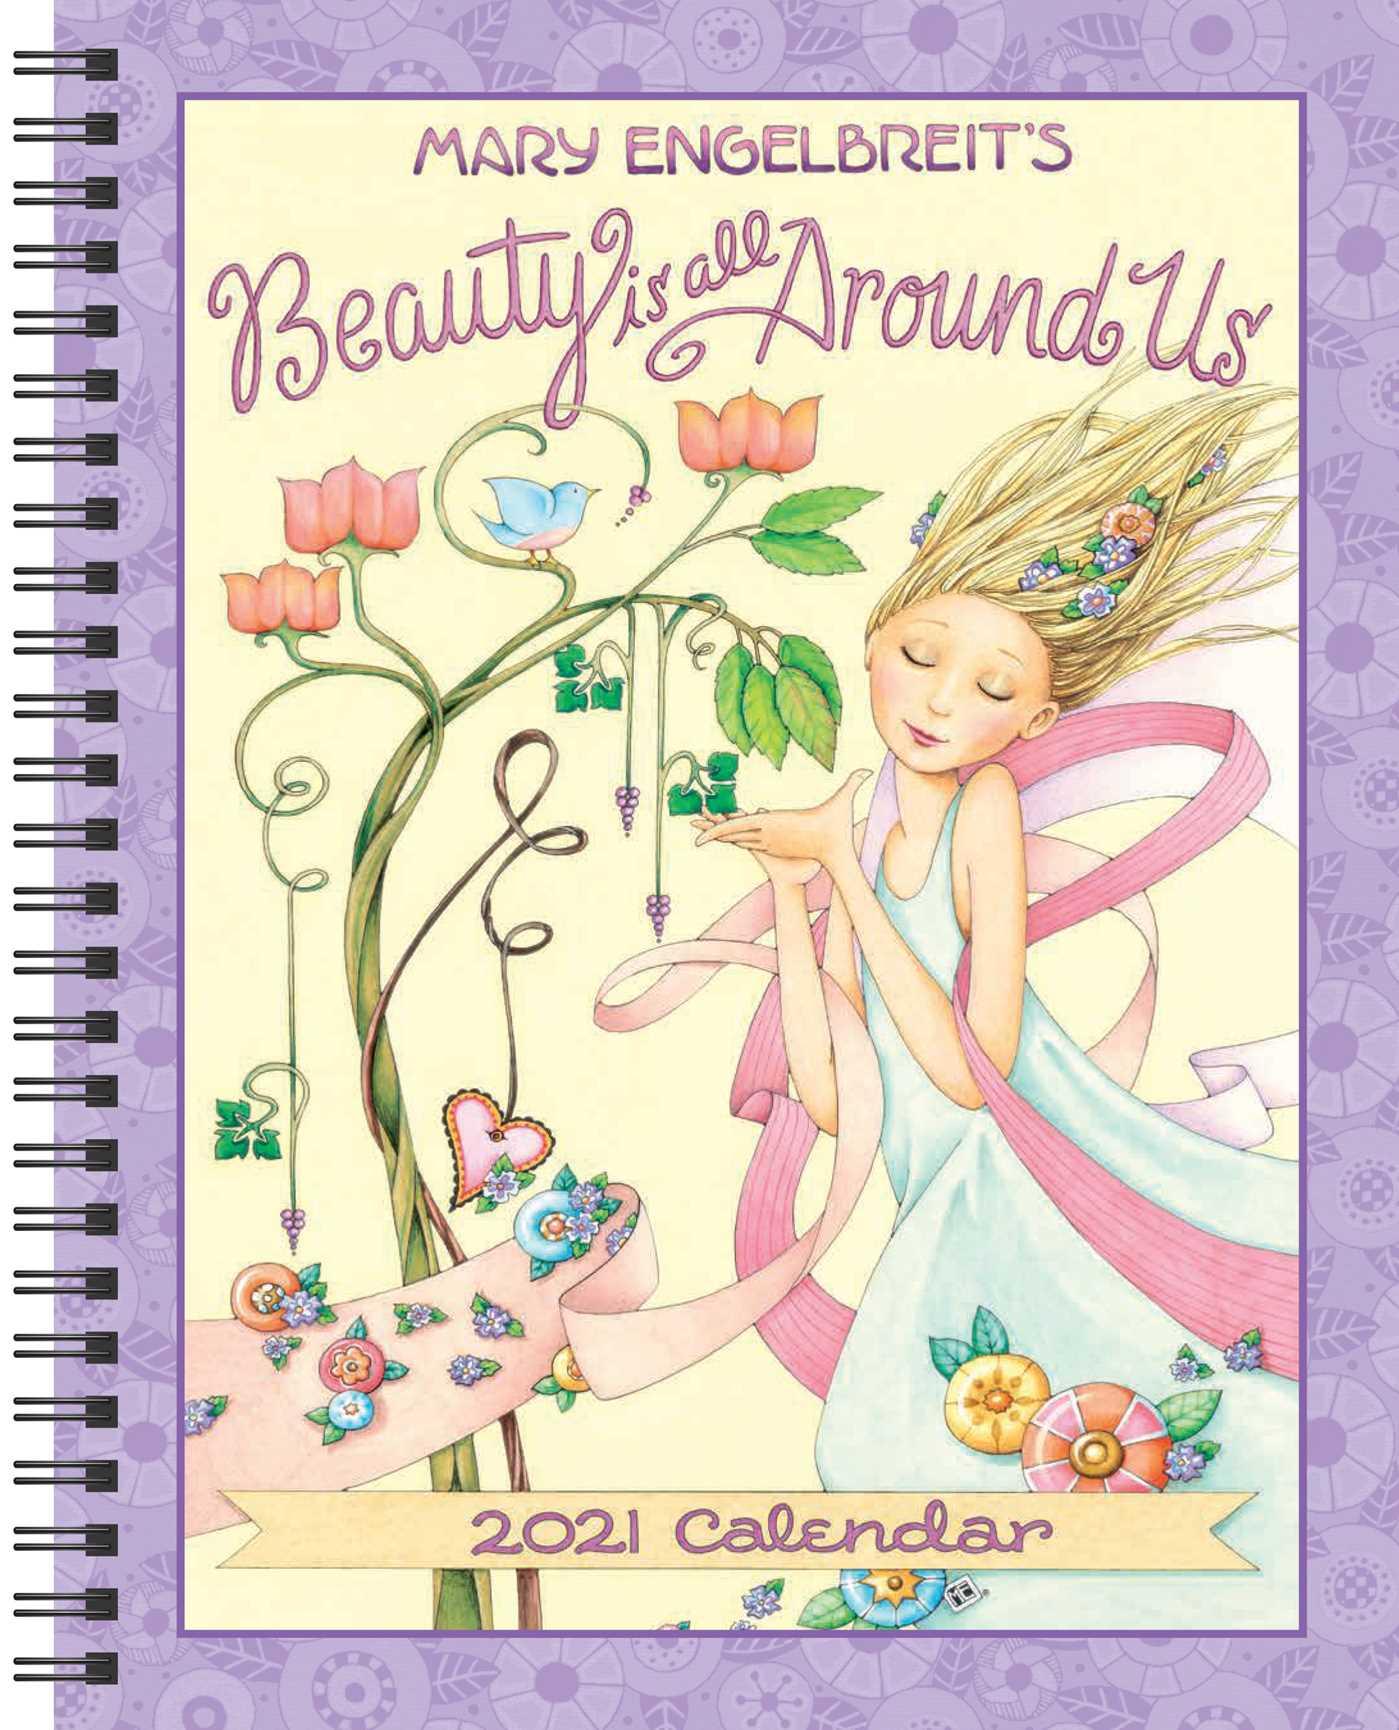 Mary Engelbreit 2021 Calendar Mary Engelbreit 2021 Monthly/Weekly Planner Calendar   Book